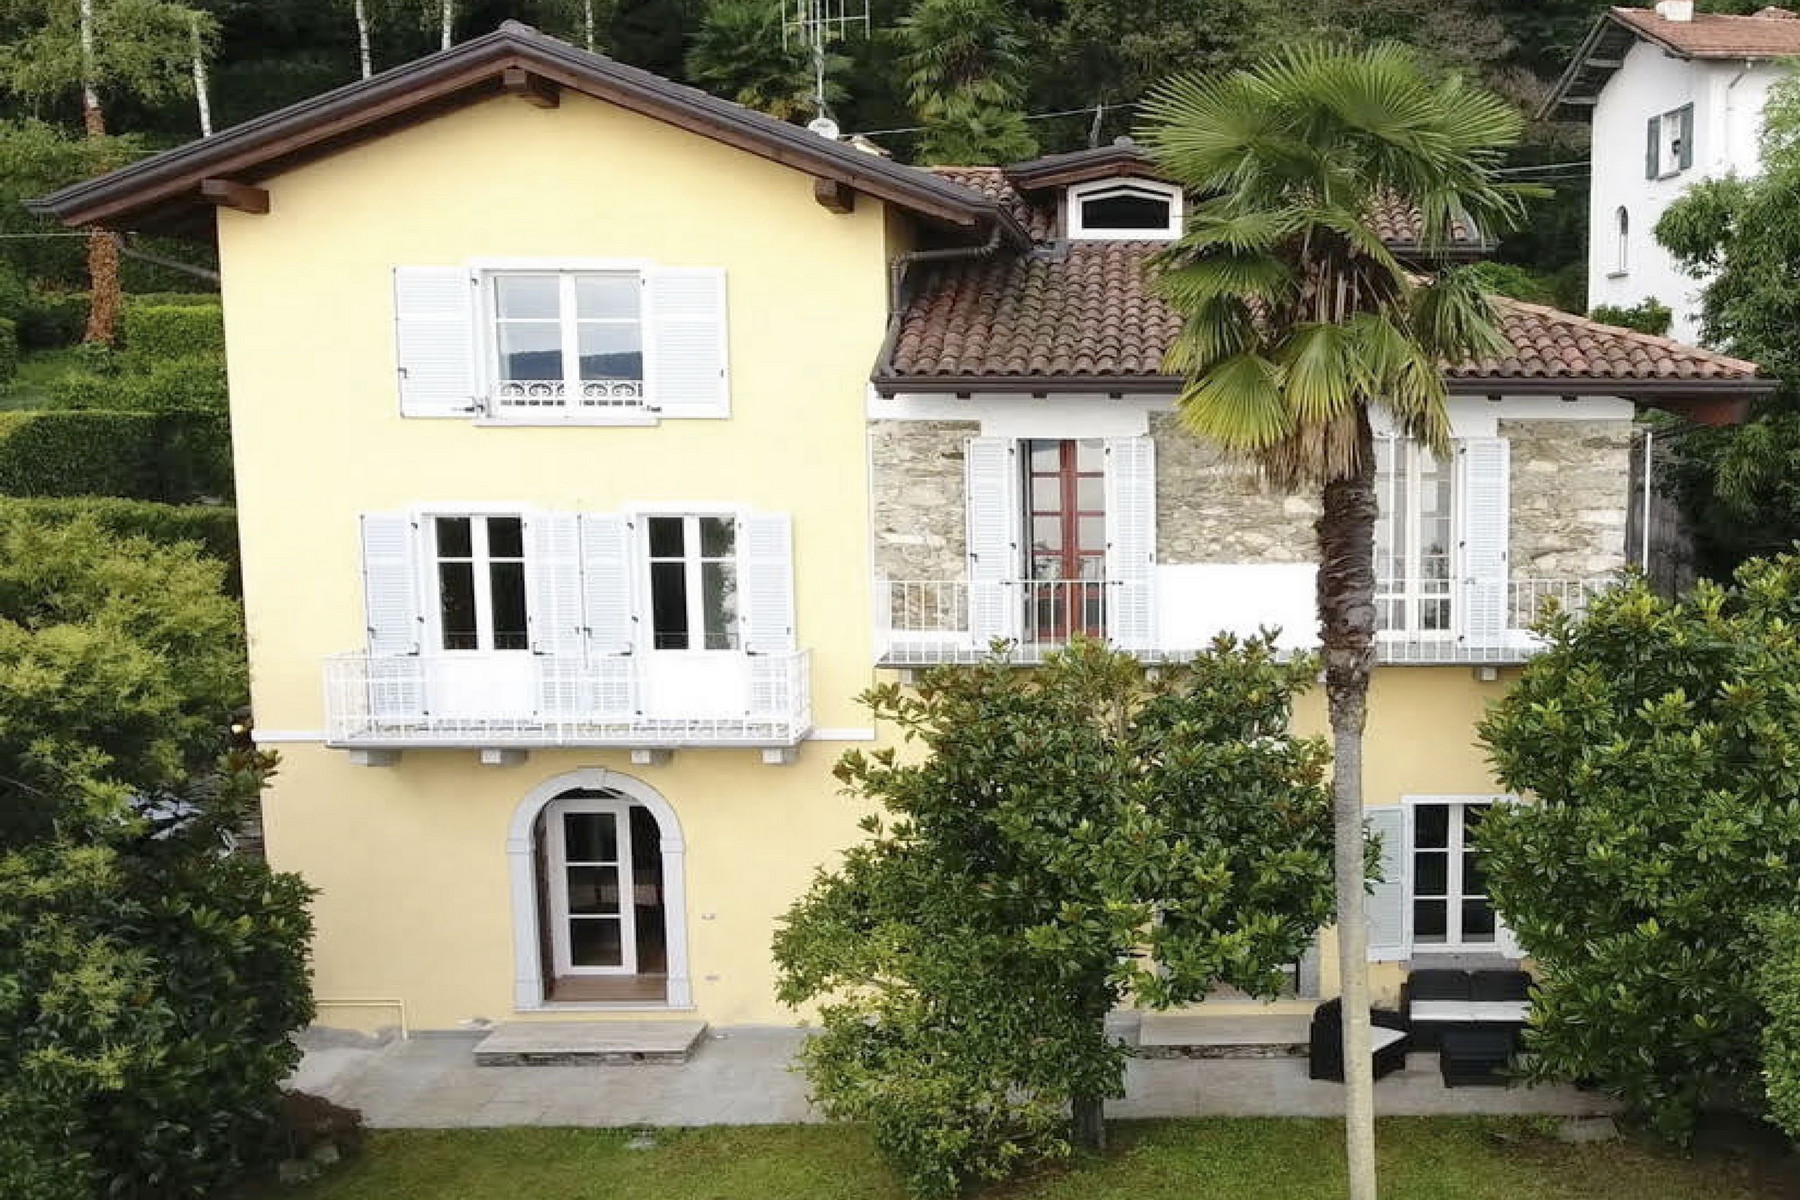 Villa in Vendita a Stresa: 5 locali, 360 mq - Foto 1